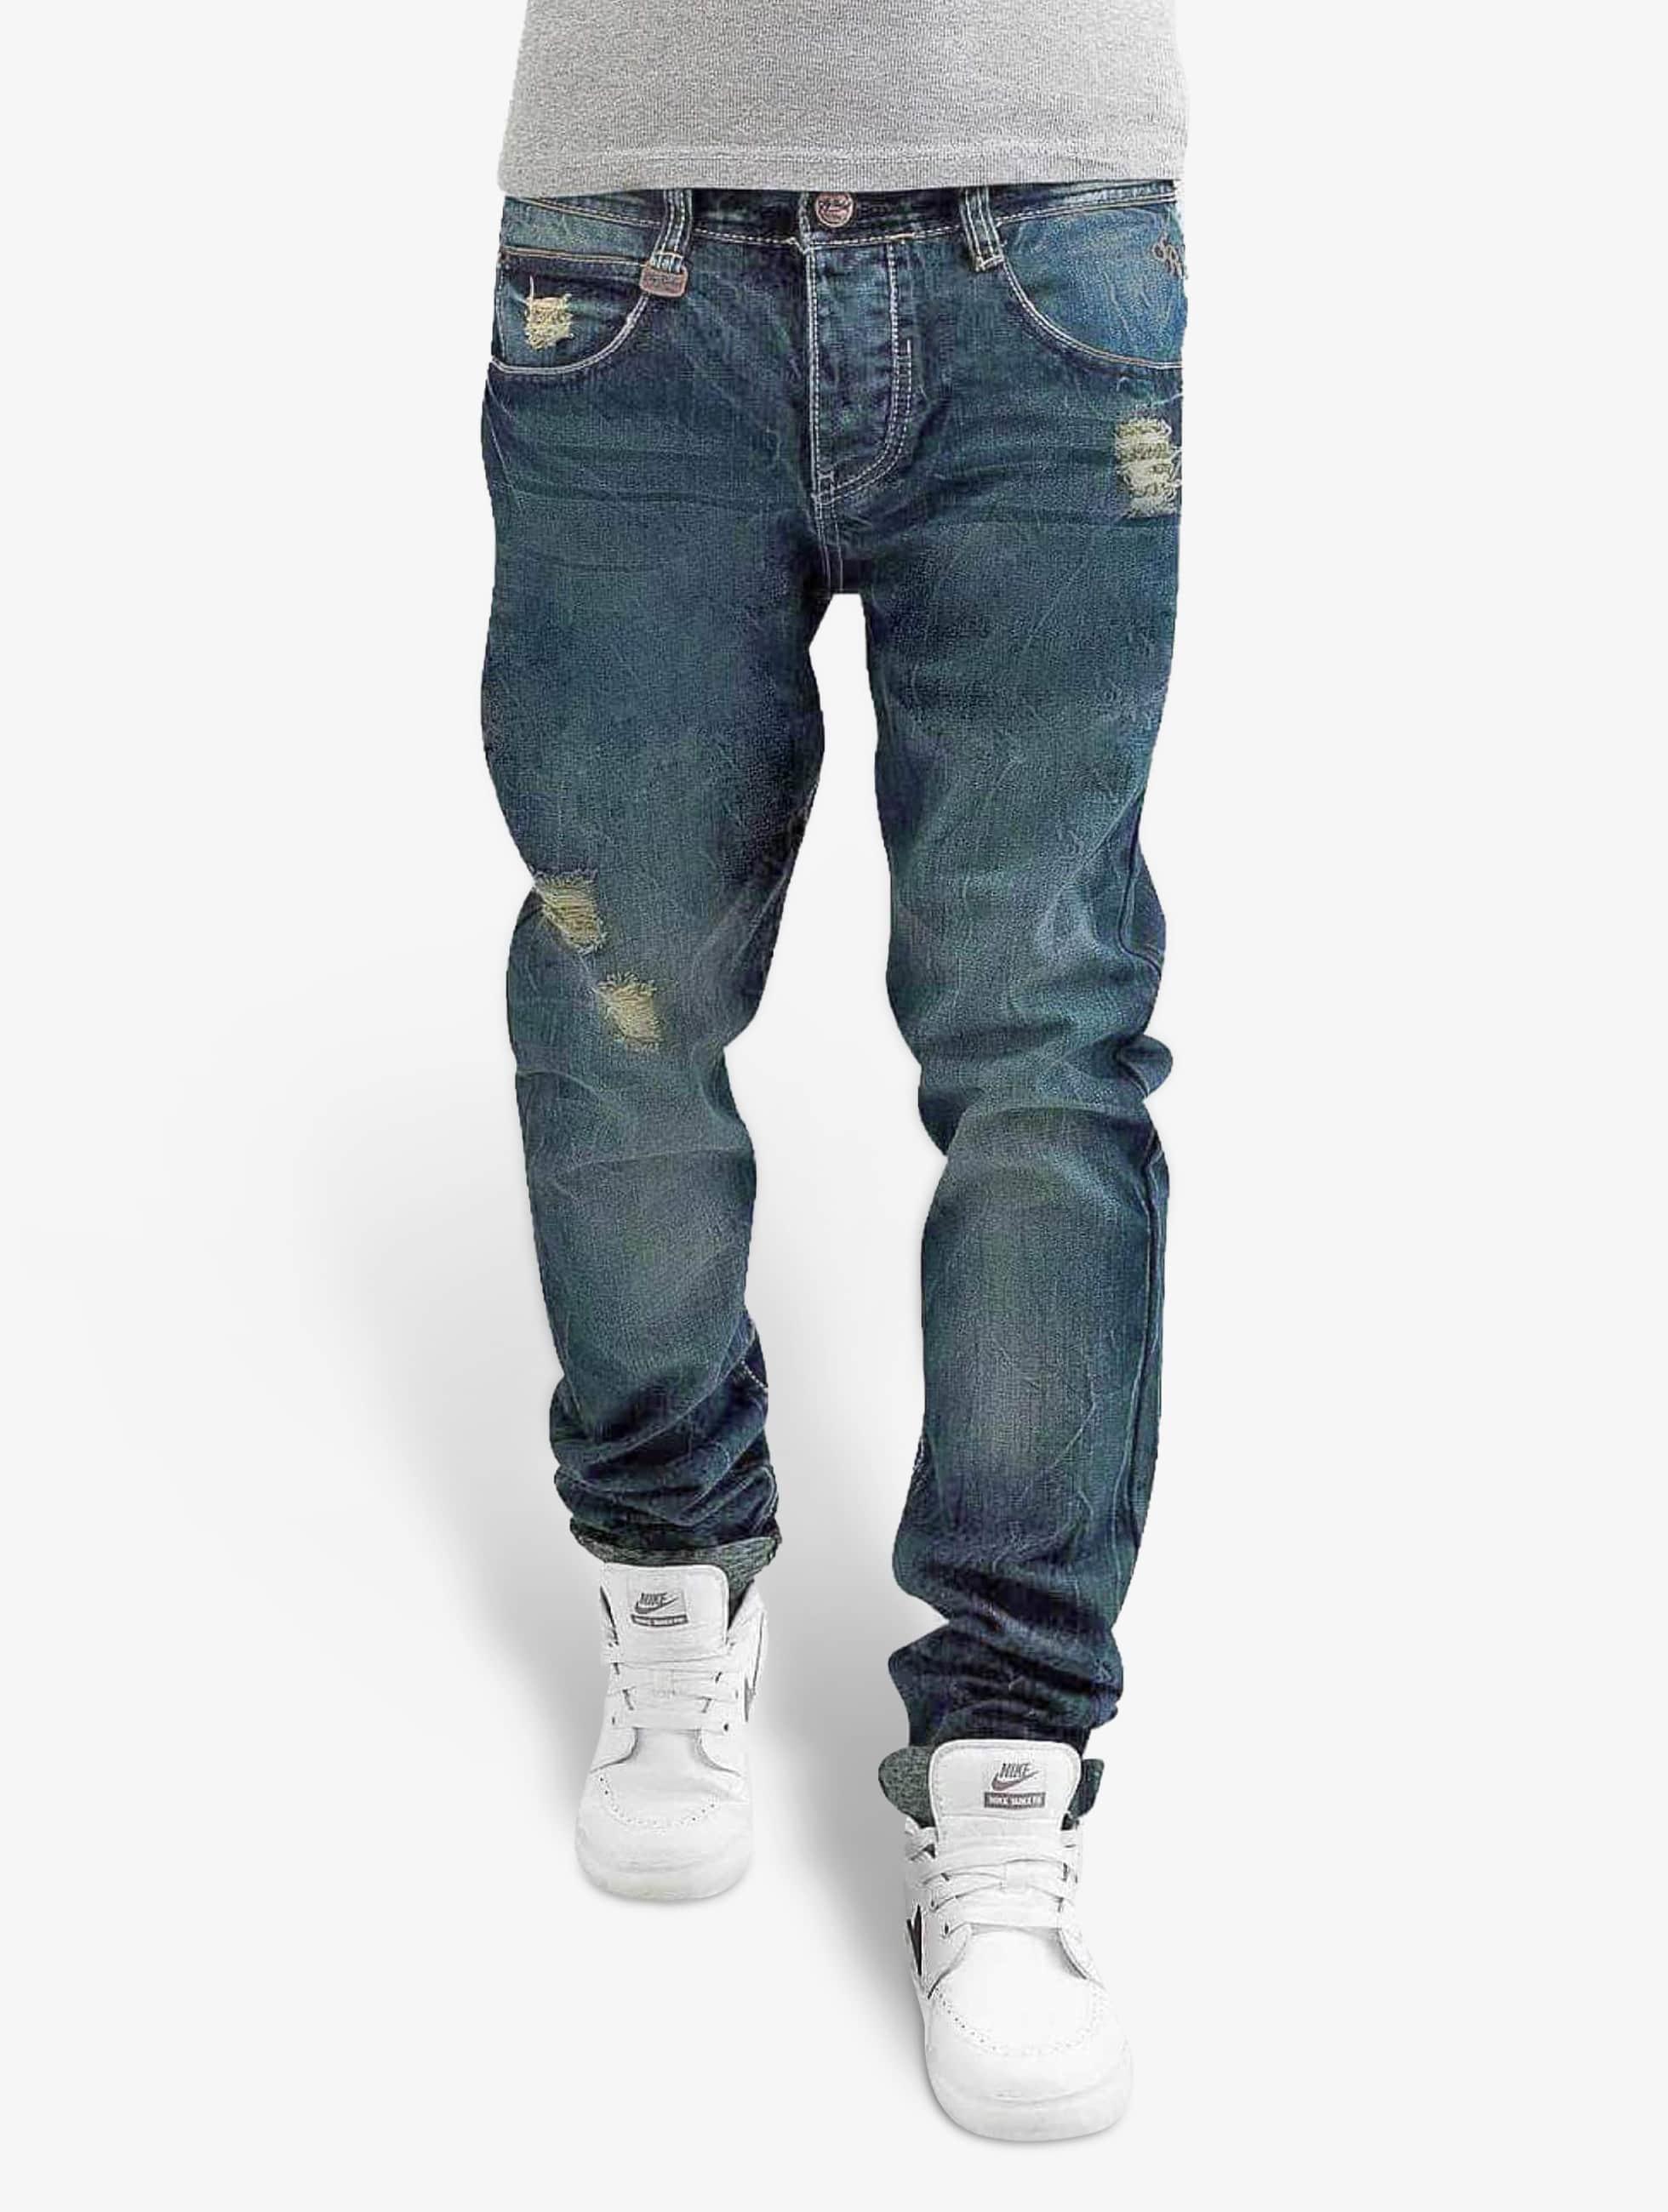 sky rebel jeans straight fit jeans sky rebel in blauw 117915. Black Bedroom Furniture Sets. Home Design Ideas